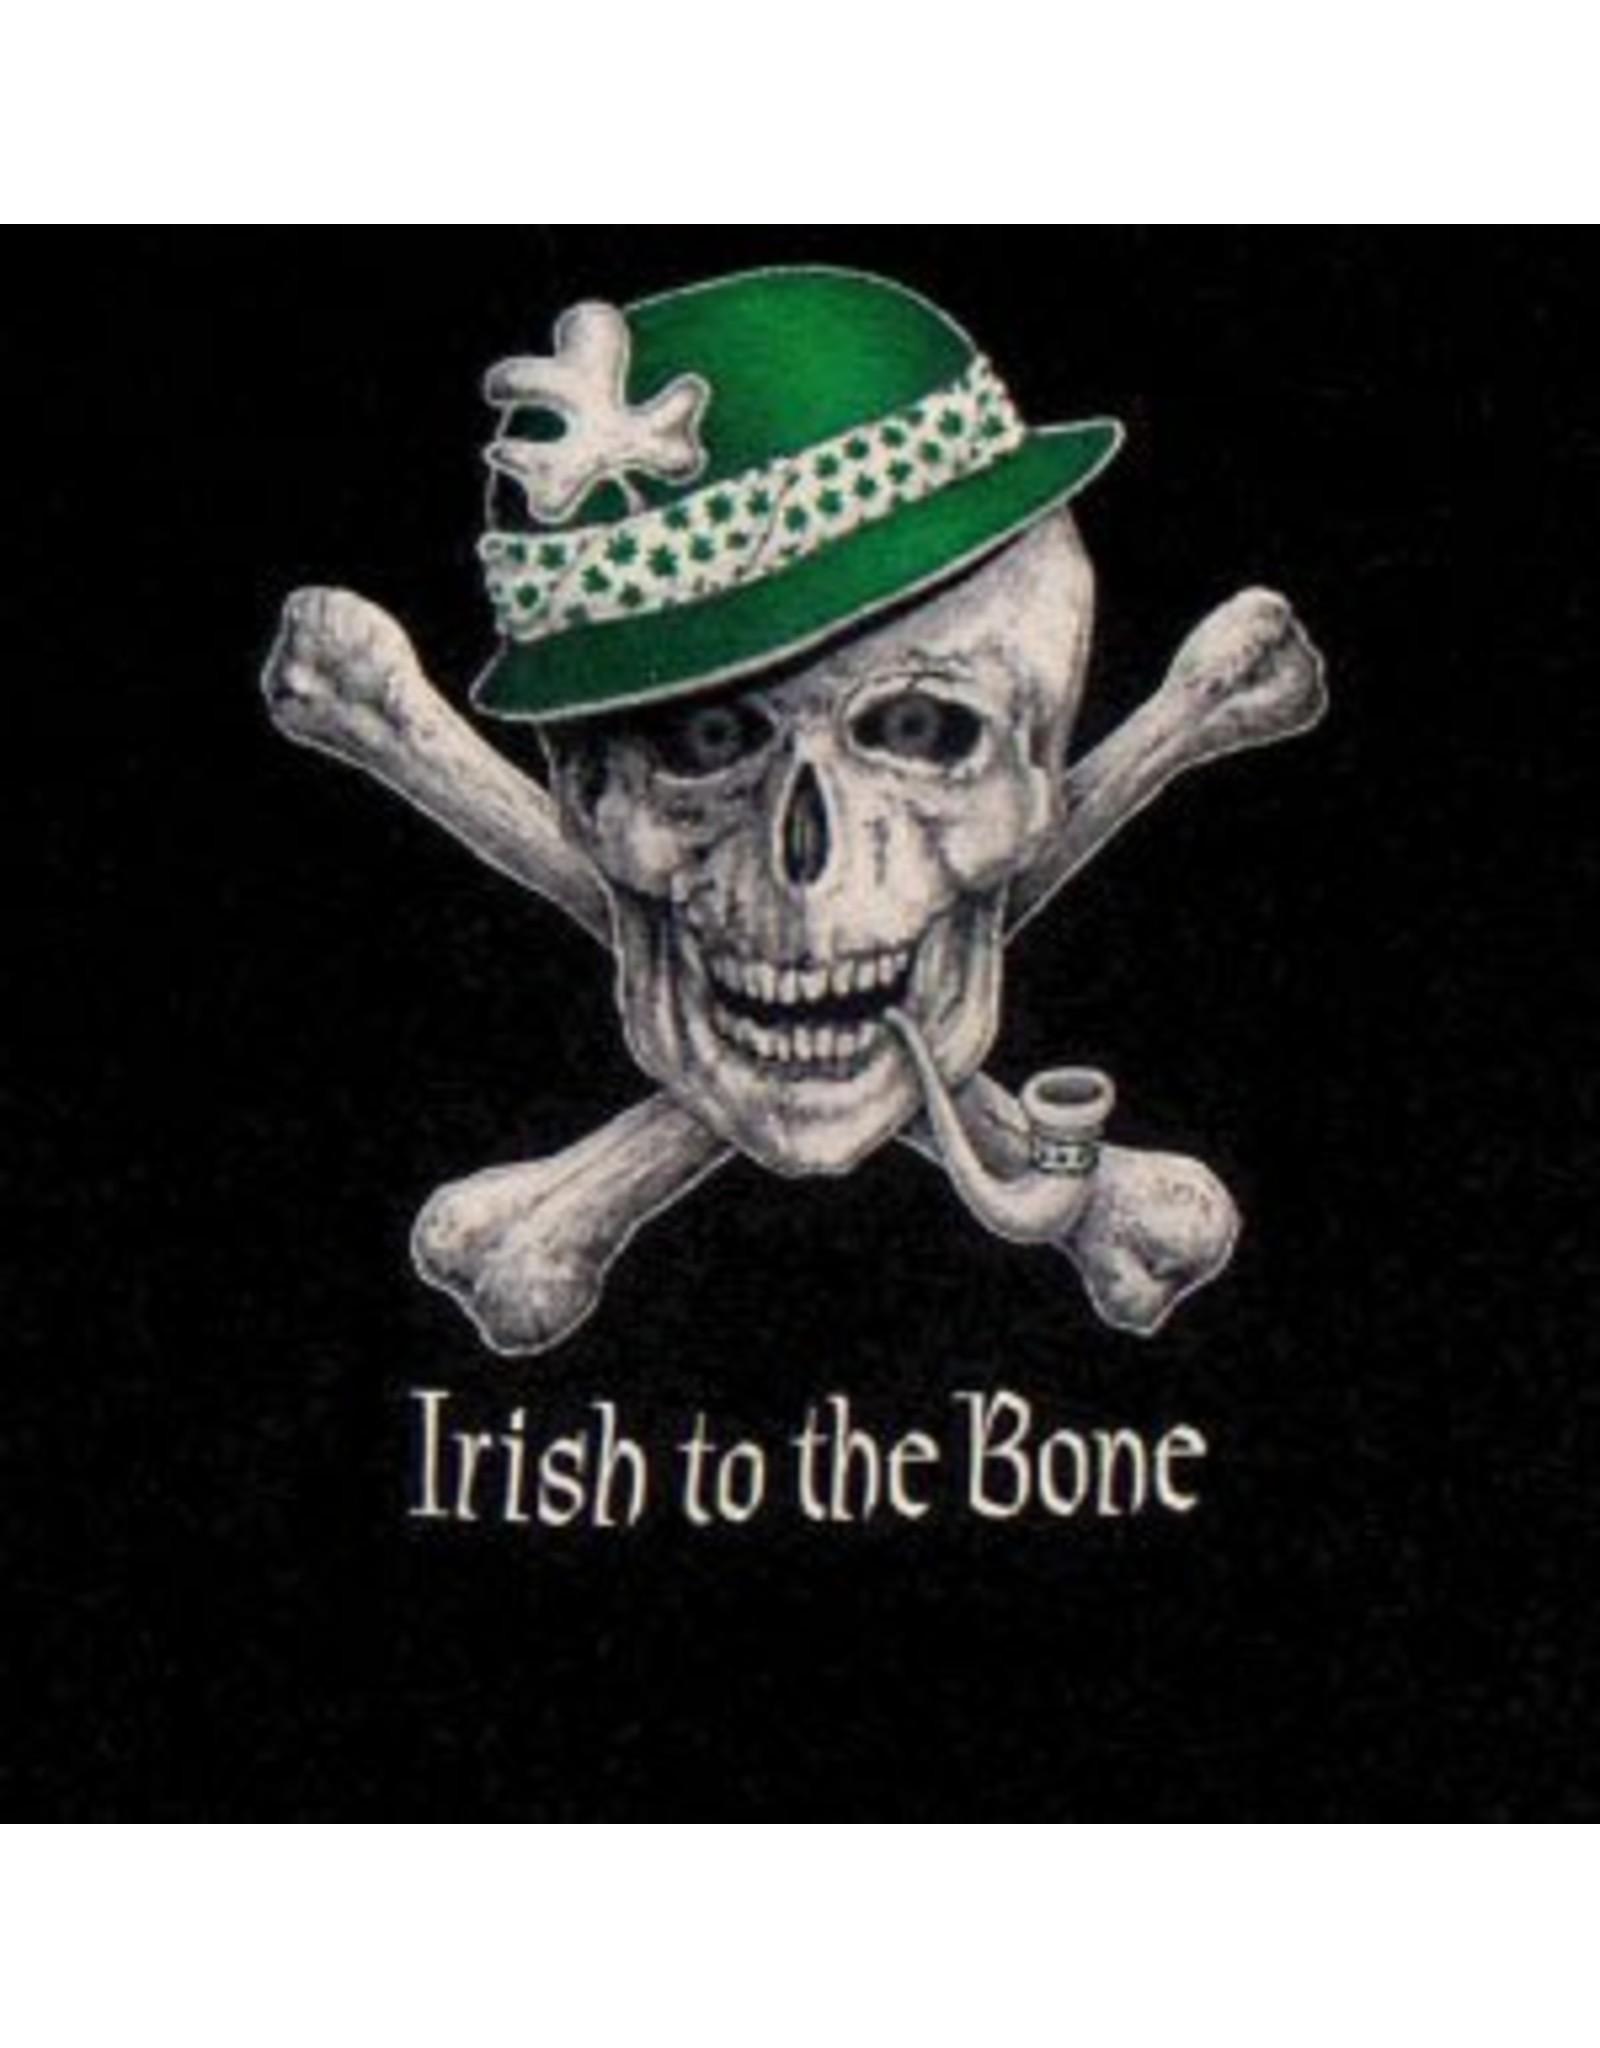 Irish ASAP Irish to the Bone Skull T-Shirt